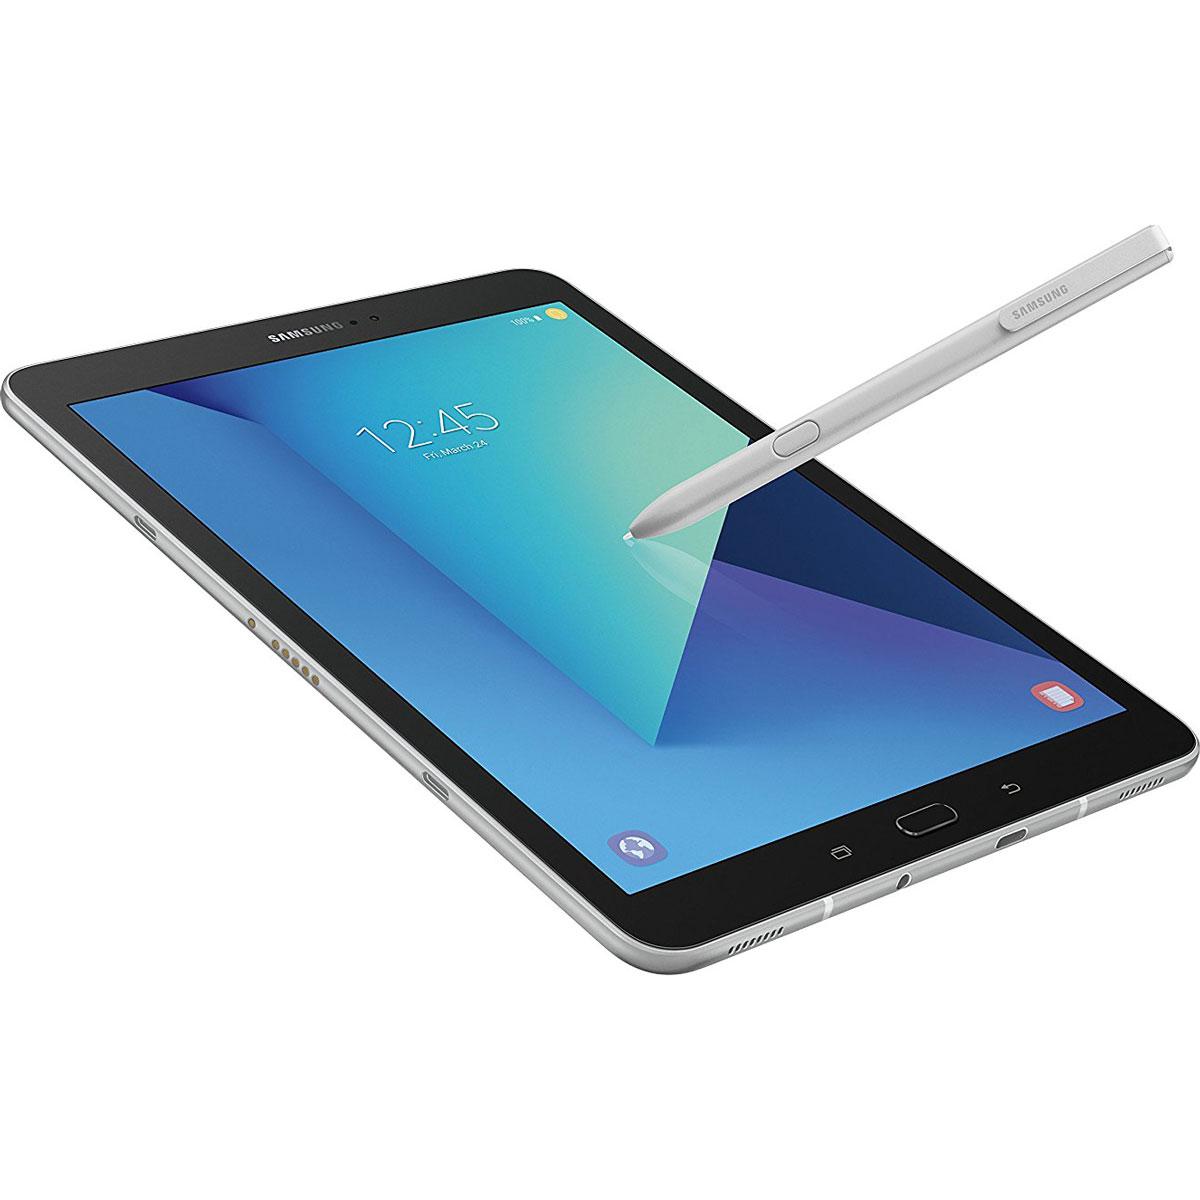 samsung galaxy tab s3 9 7 inch tablet w s pen silver. Black Bedroom Furniture Sets. Home Design Ideas